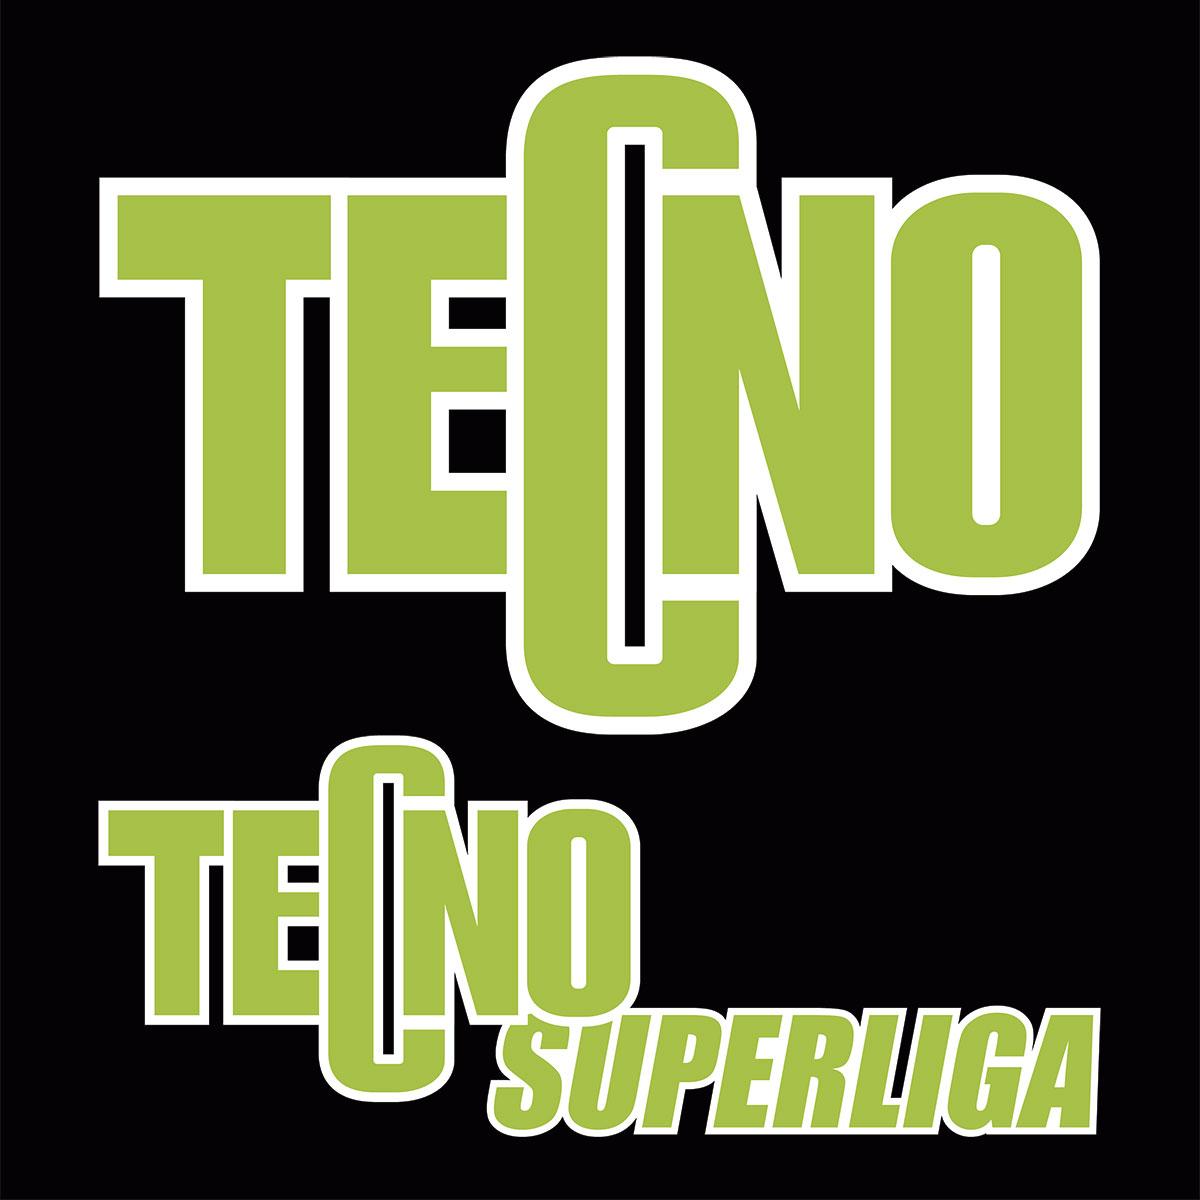 tecno_logo_1 pablomad